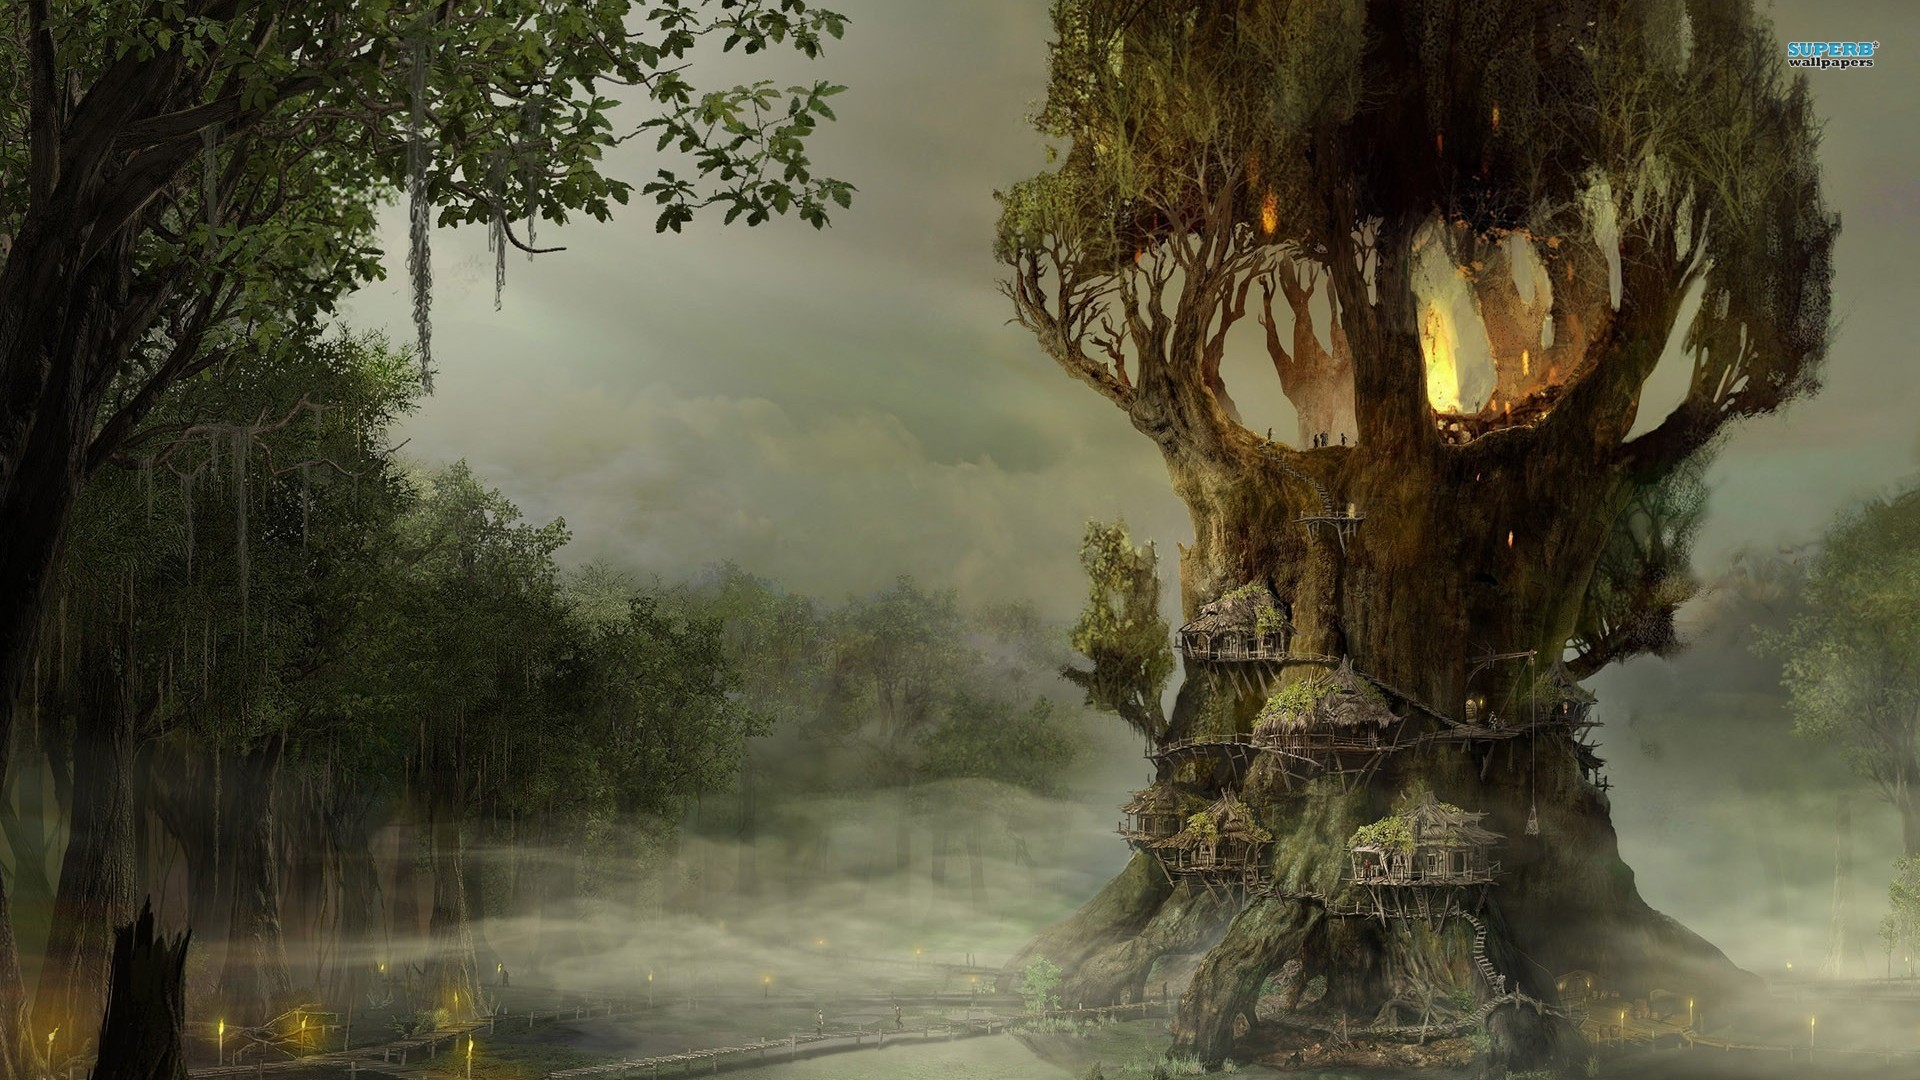 Yggdrasil Tree Fantasy Hd Wallpaper X